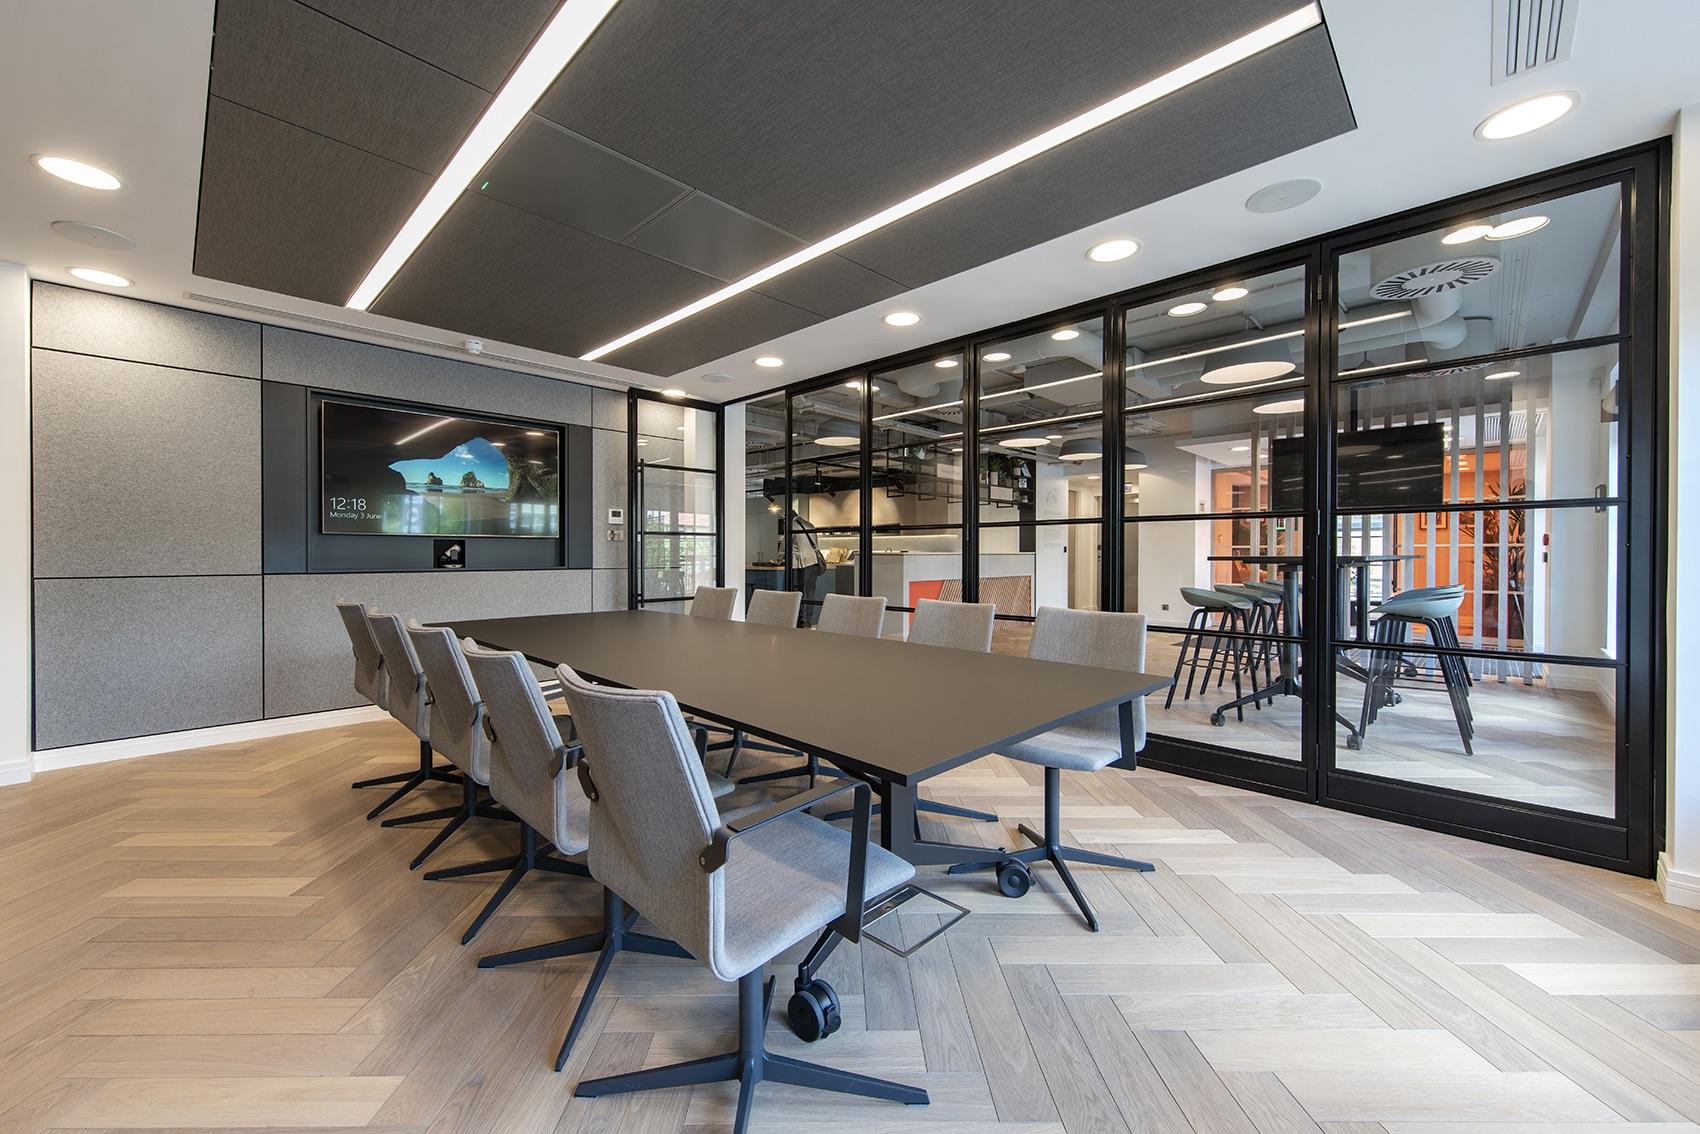 peldon-rose-new-office-london-15